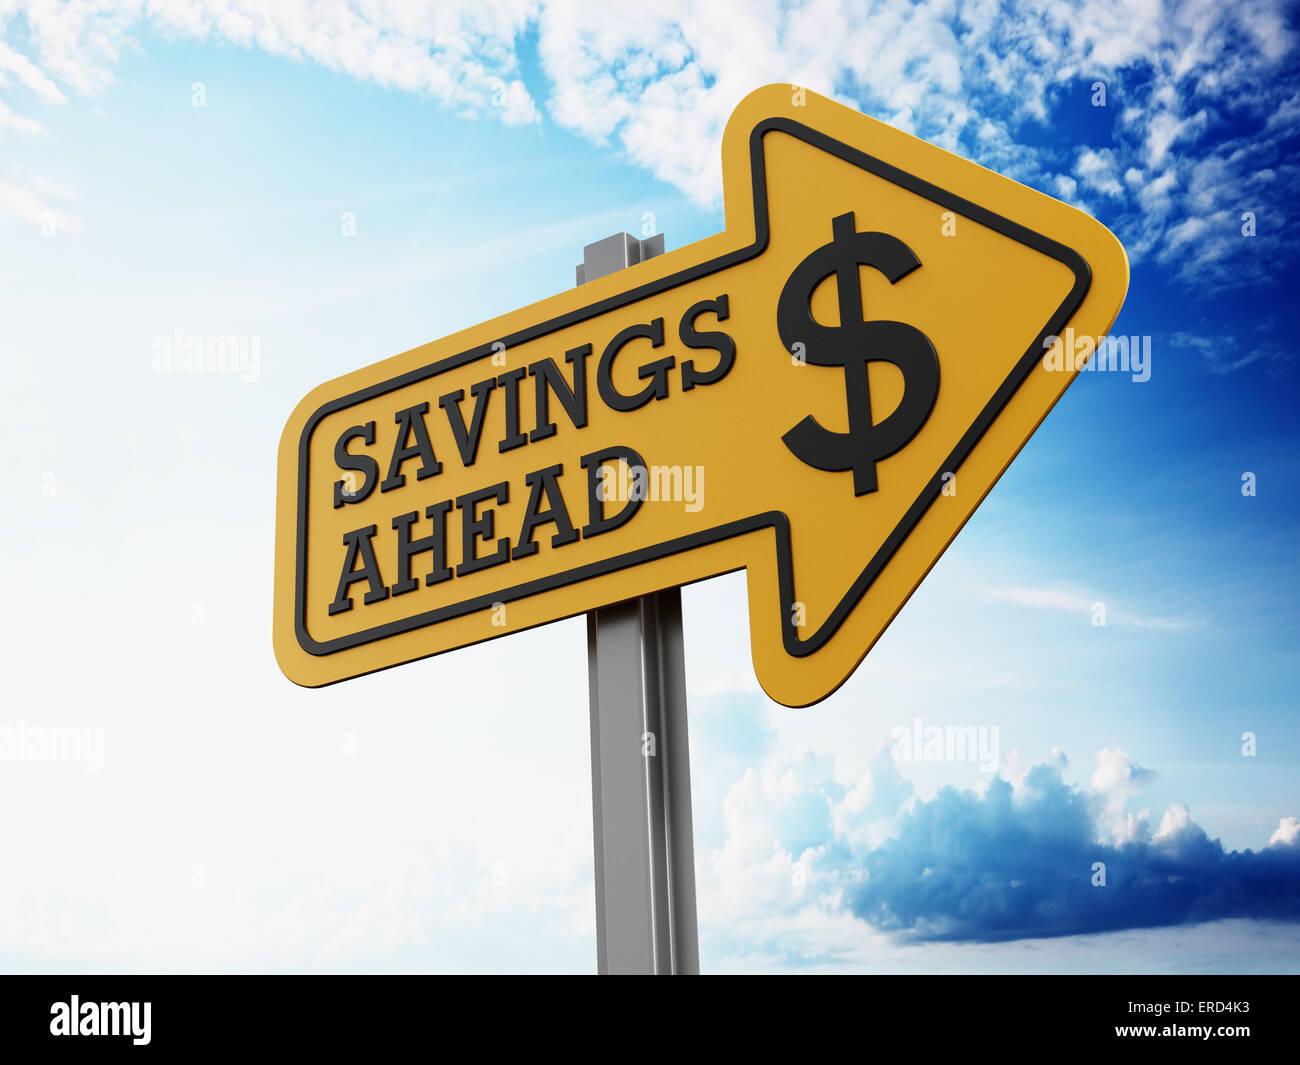 Savings ahead signboard on blue sky - Stock Image